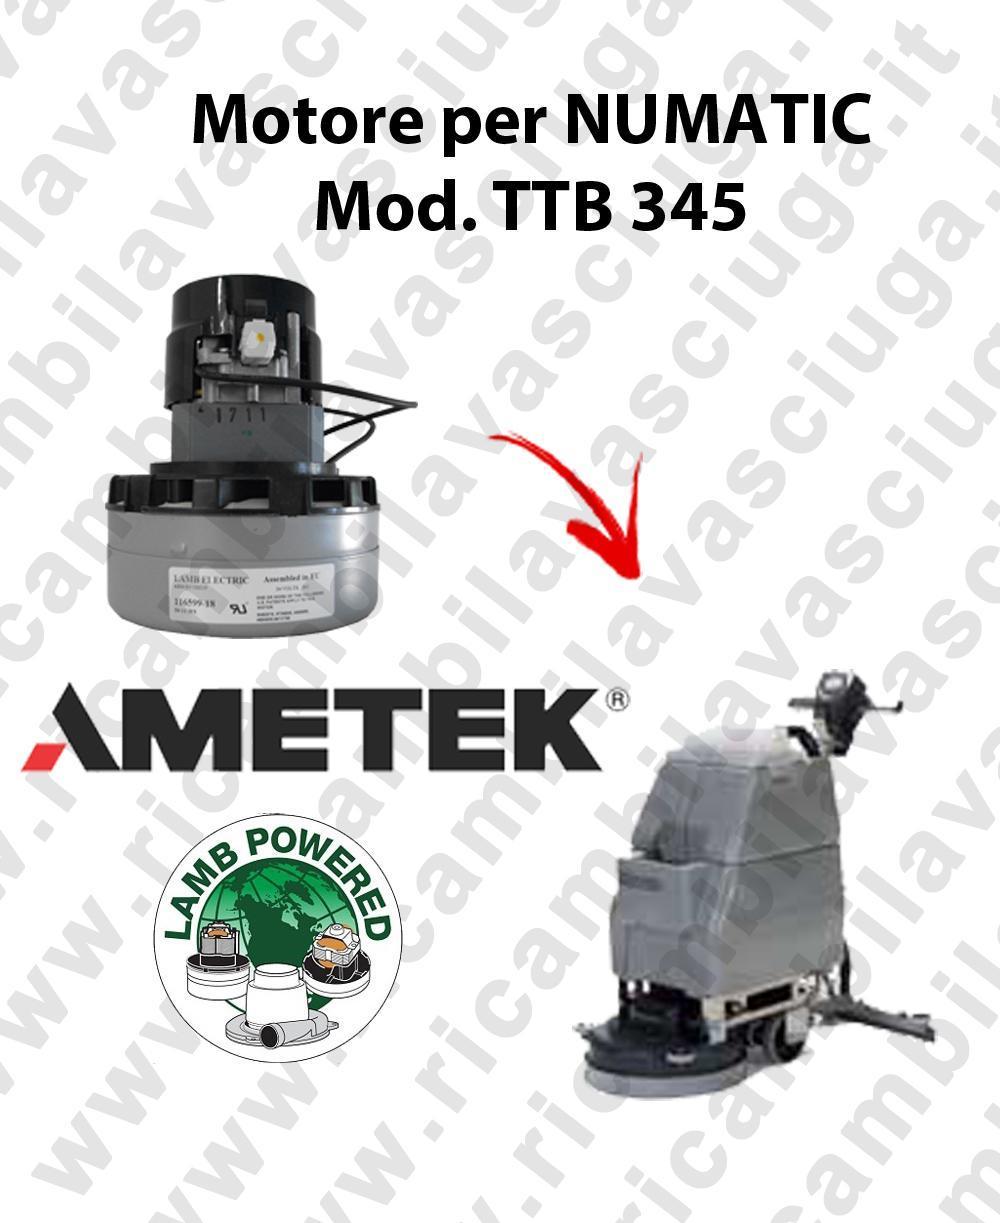 TTB 345 Ametek Vacuum Motor scrubber dryer NUMATIC